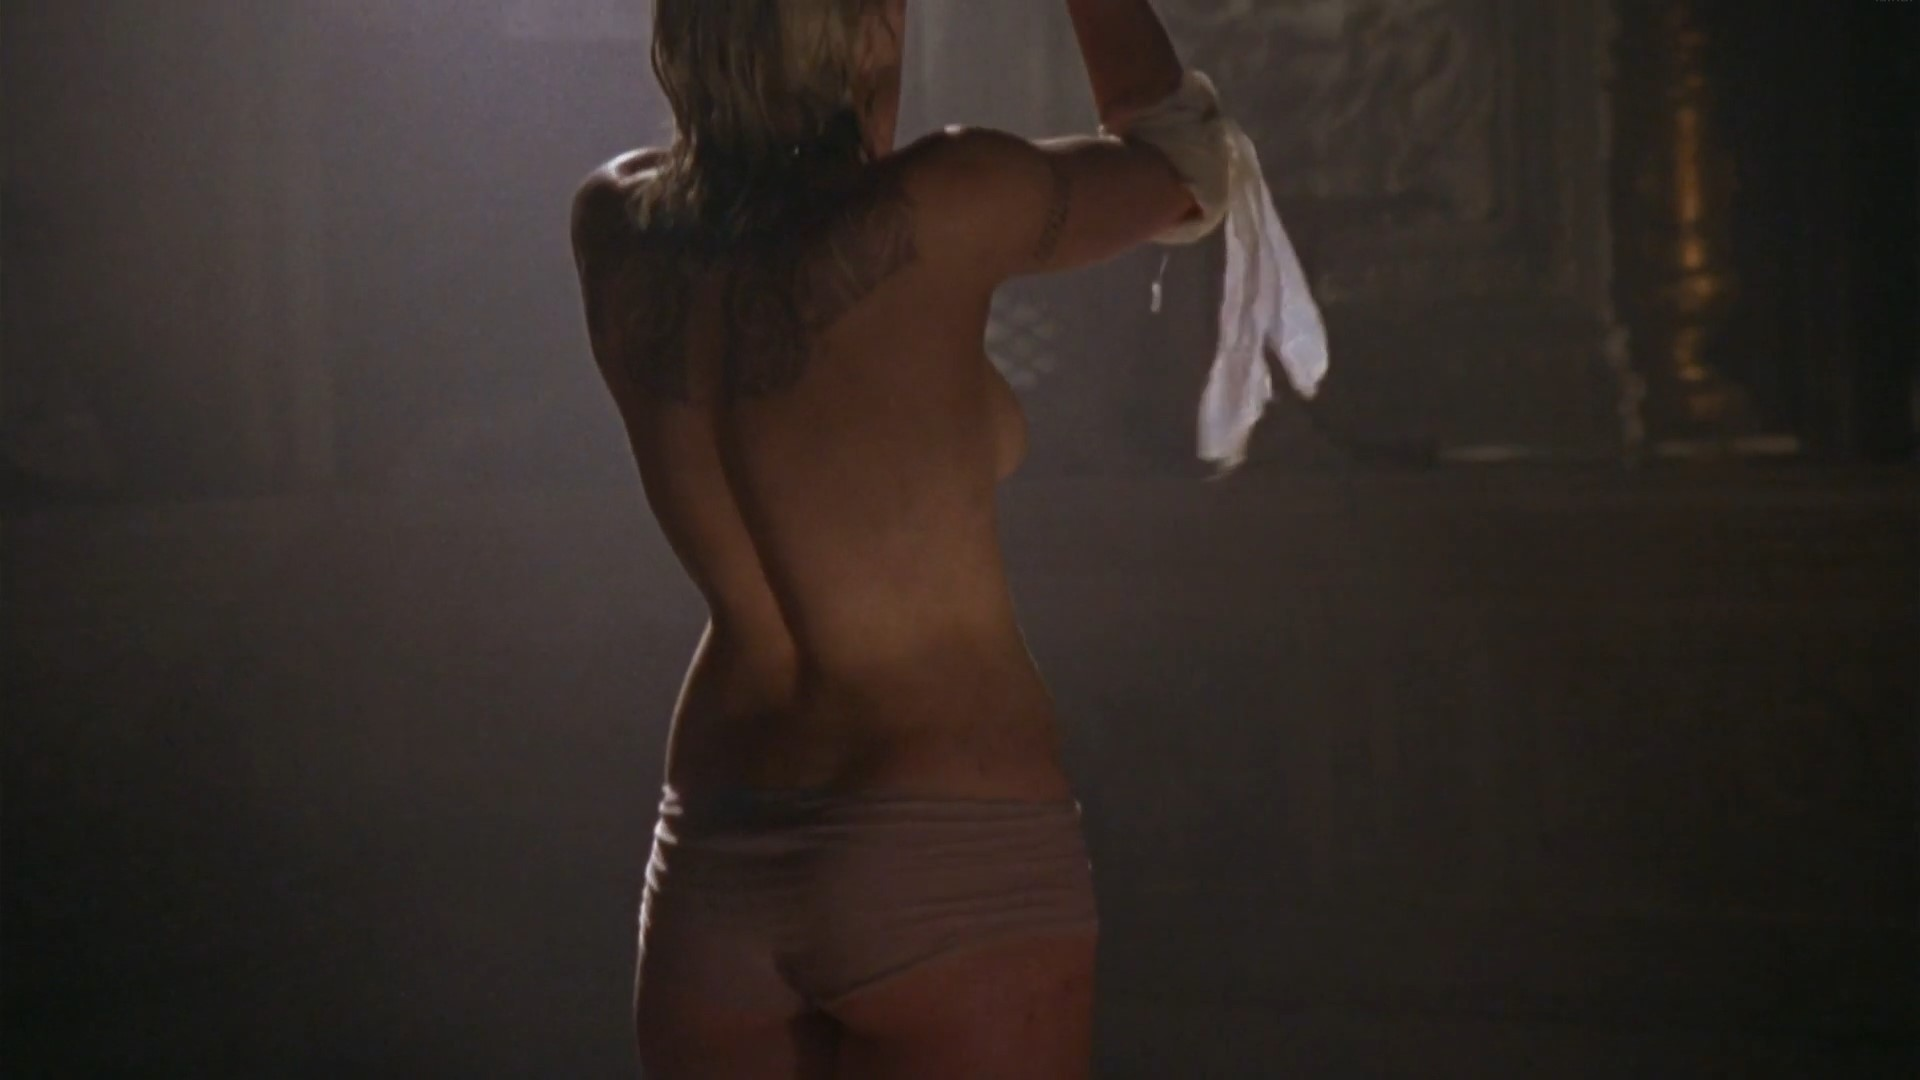 Aitana Vk Porno watch online - dominique swain, tori glawe osborn - eminence